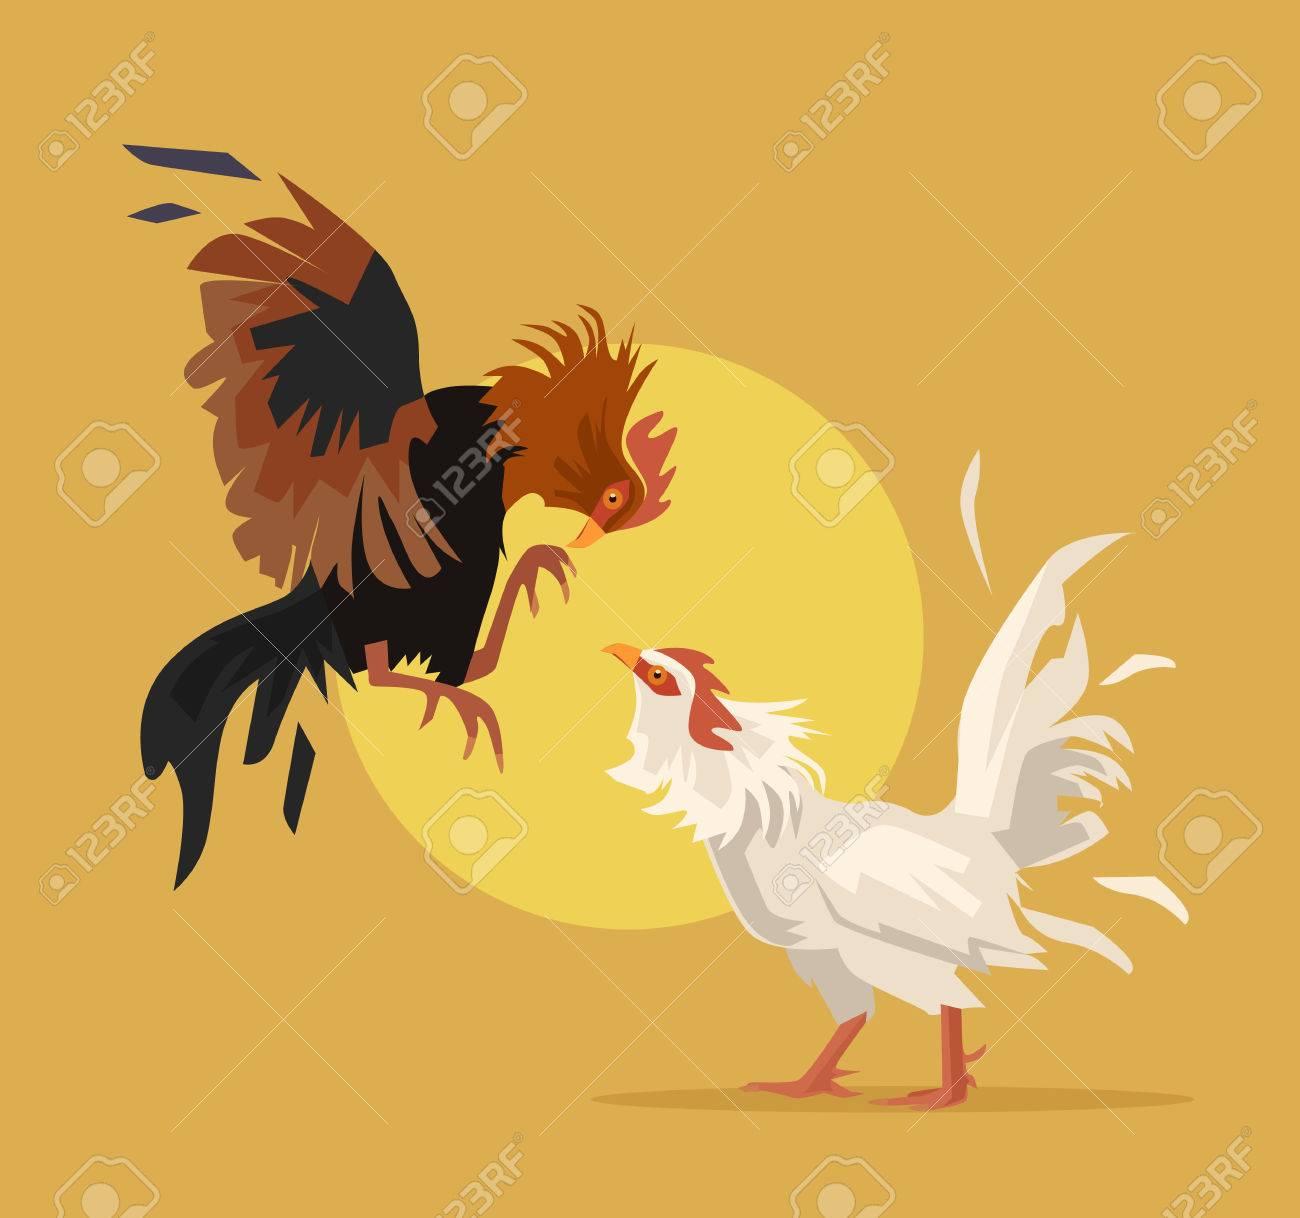 Two cocks fighting. Vector flat cartoon illustration - 55211934